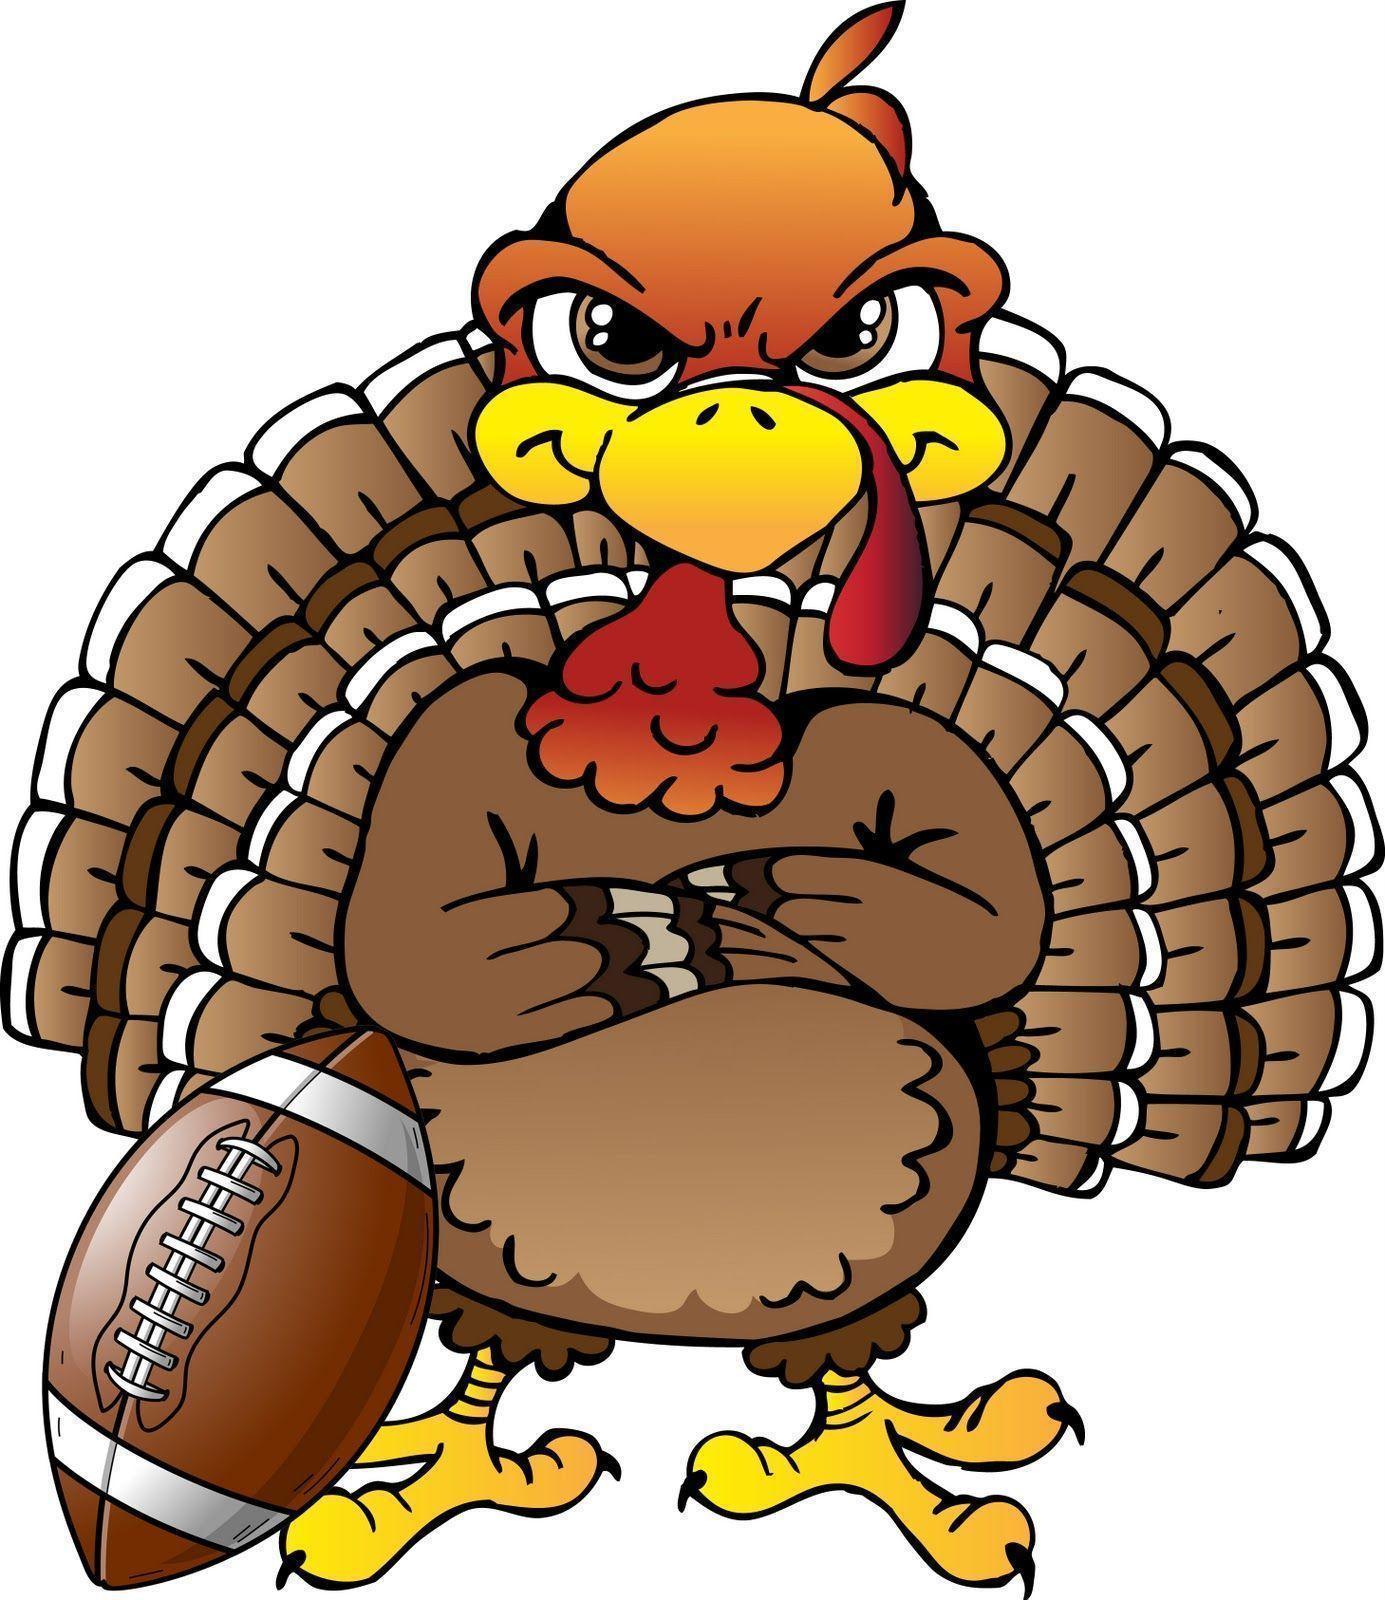 Funny Thanksgiving Backgrounds - Wallpaper Cave Funny Cartoon Turkey Wallpaper